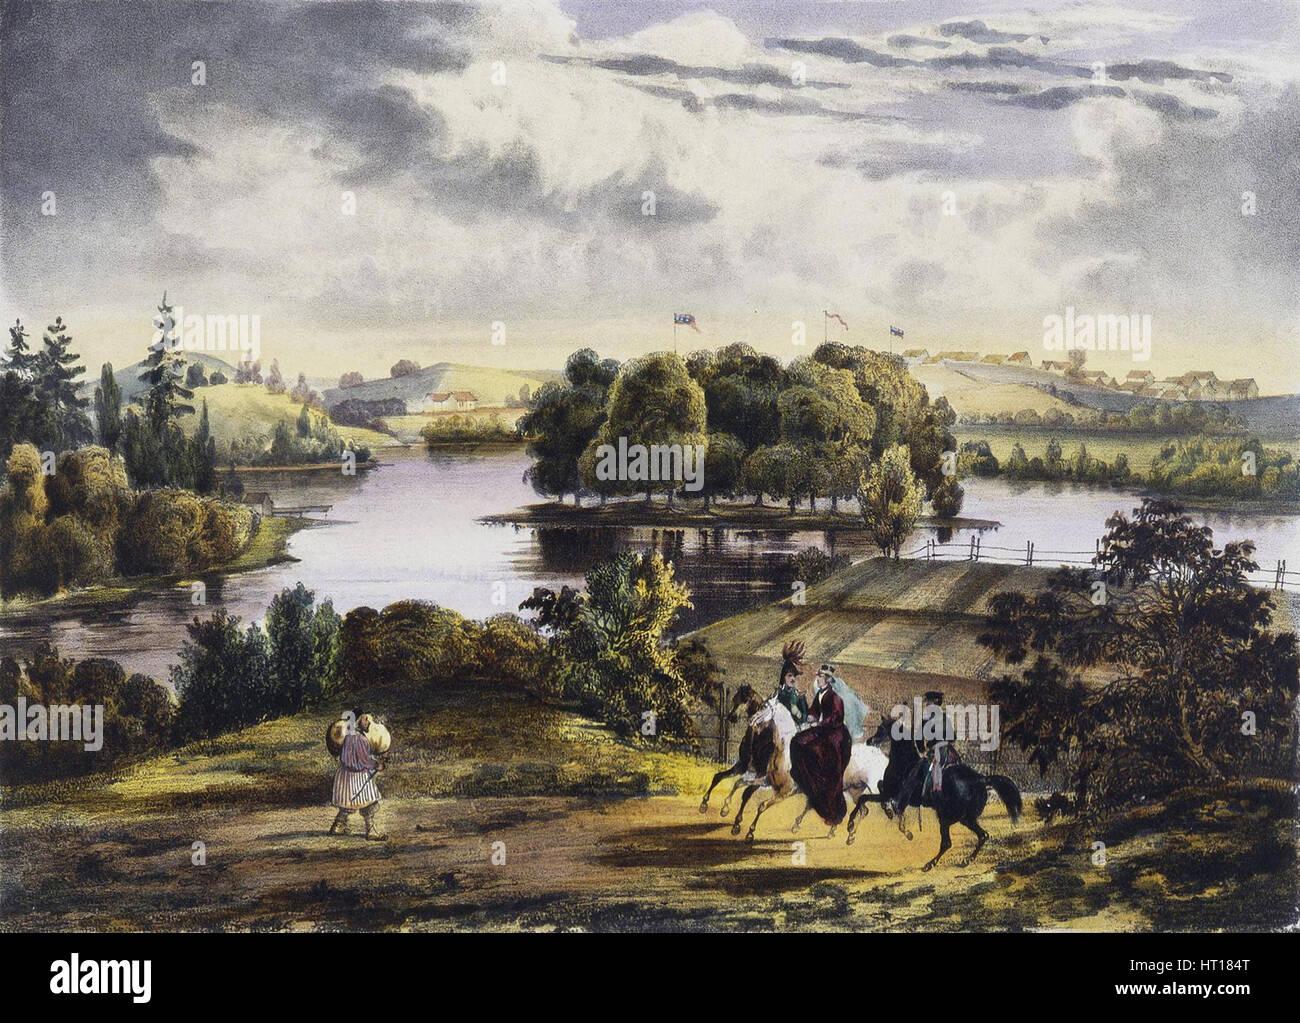 View of Izhora, 1833. Artist: Tirpeune, Adam (active 1830s) - Stock Image